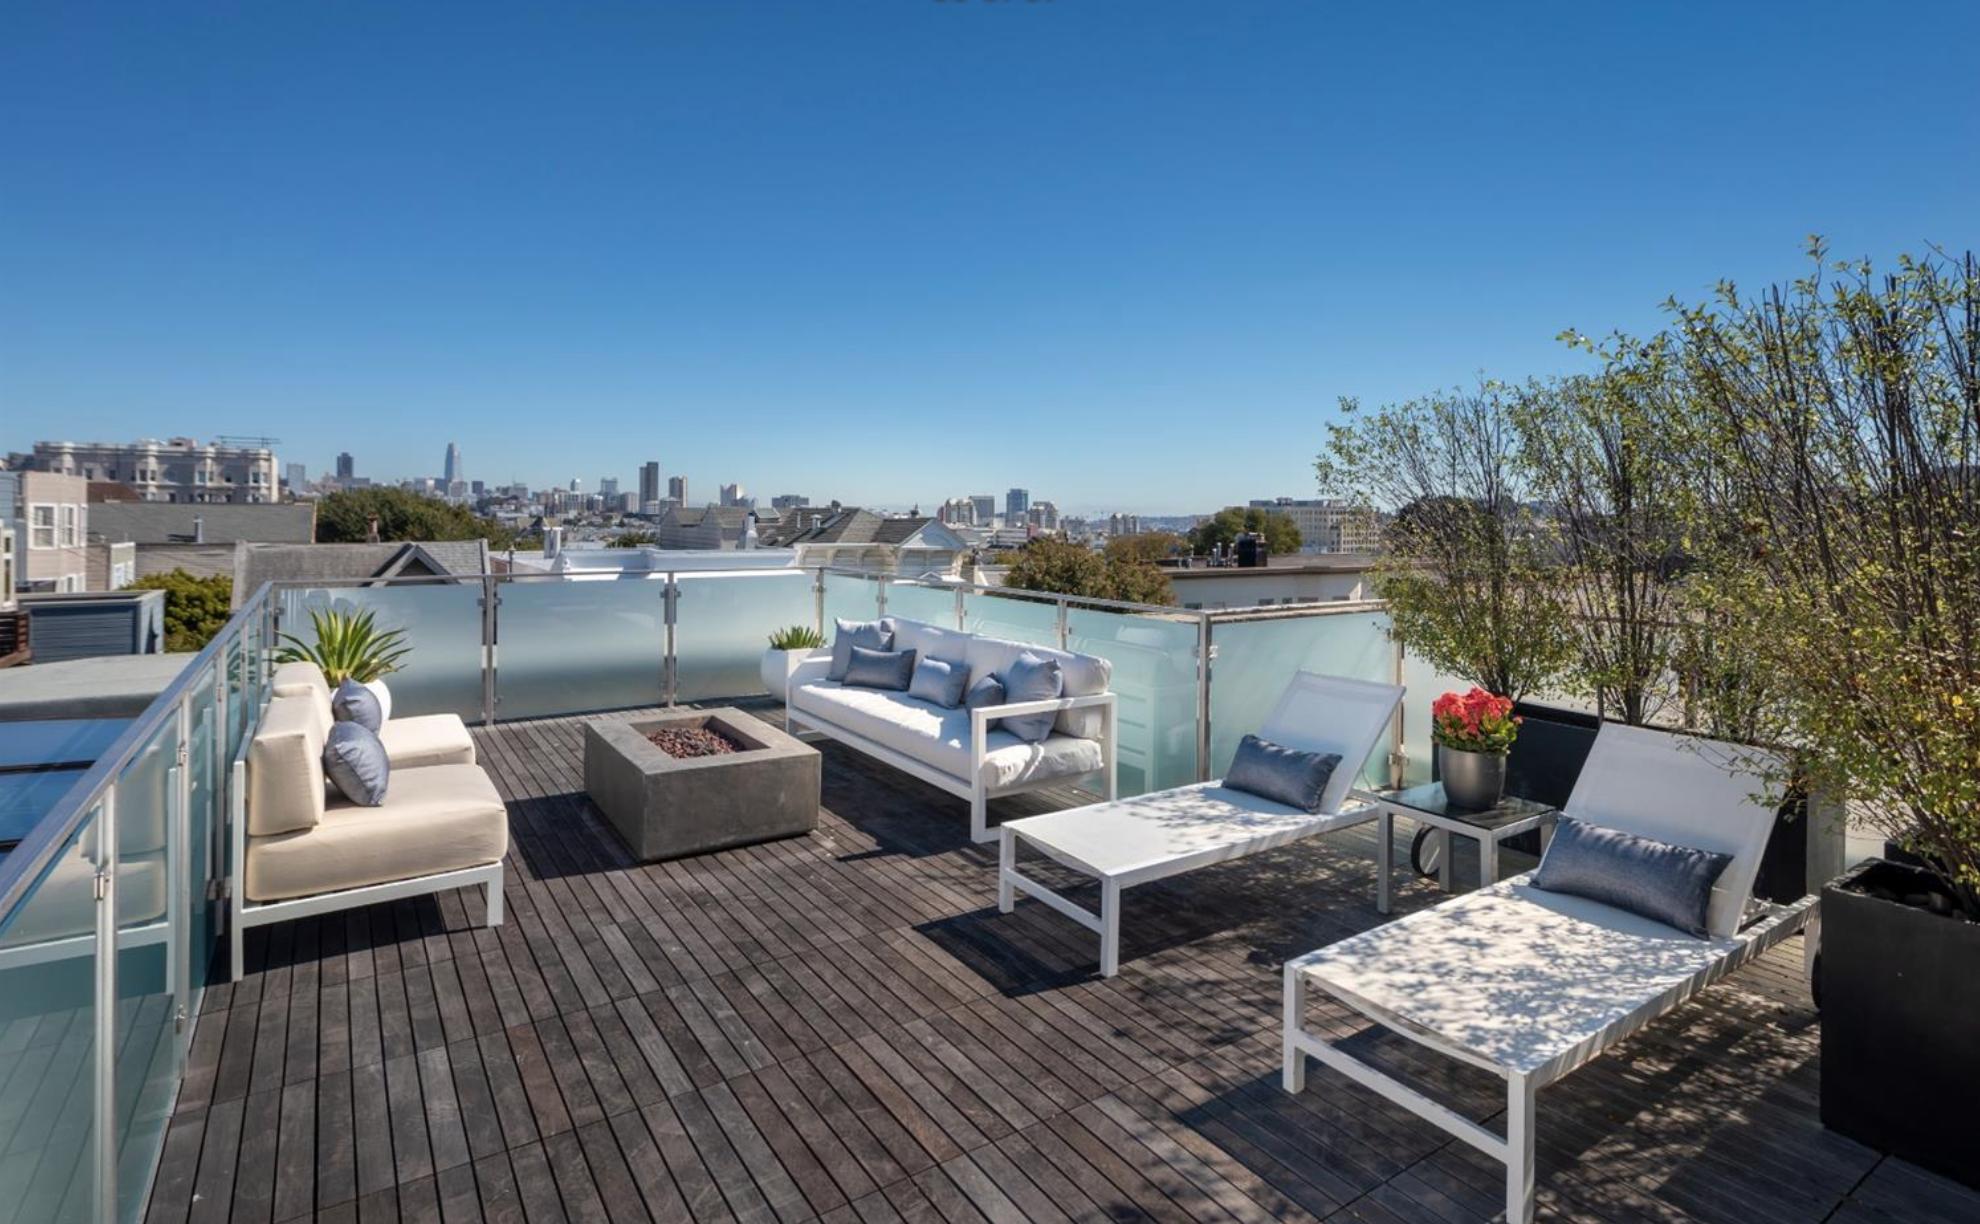 1735 Lyon Street - Rooftop Deck